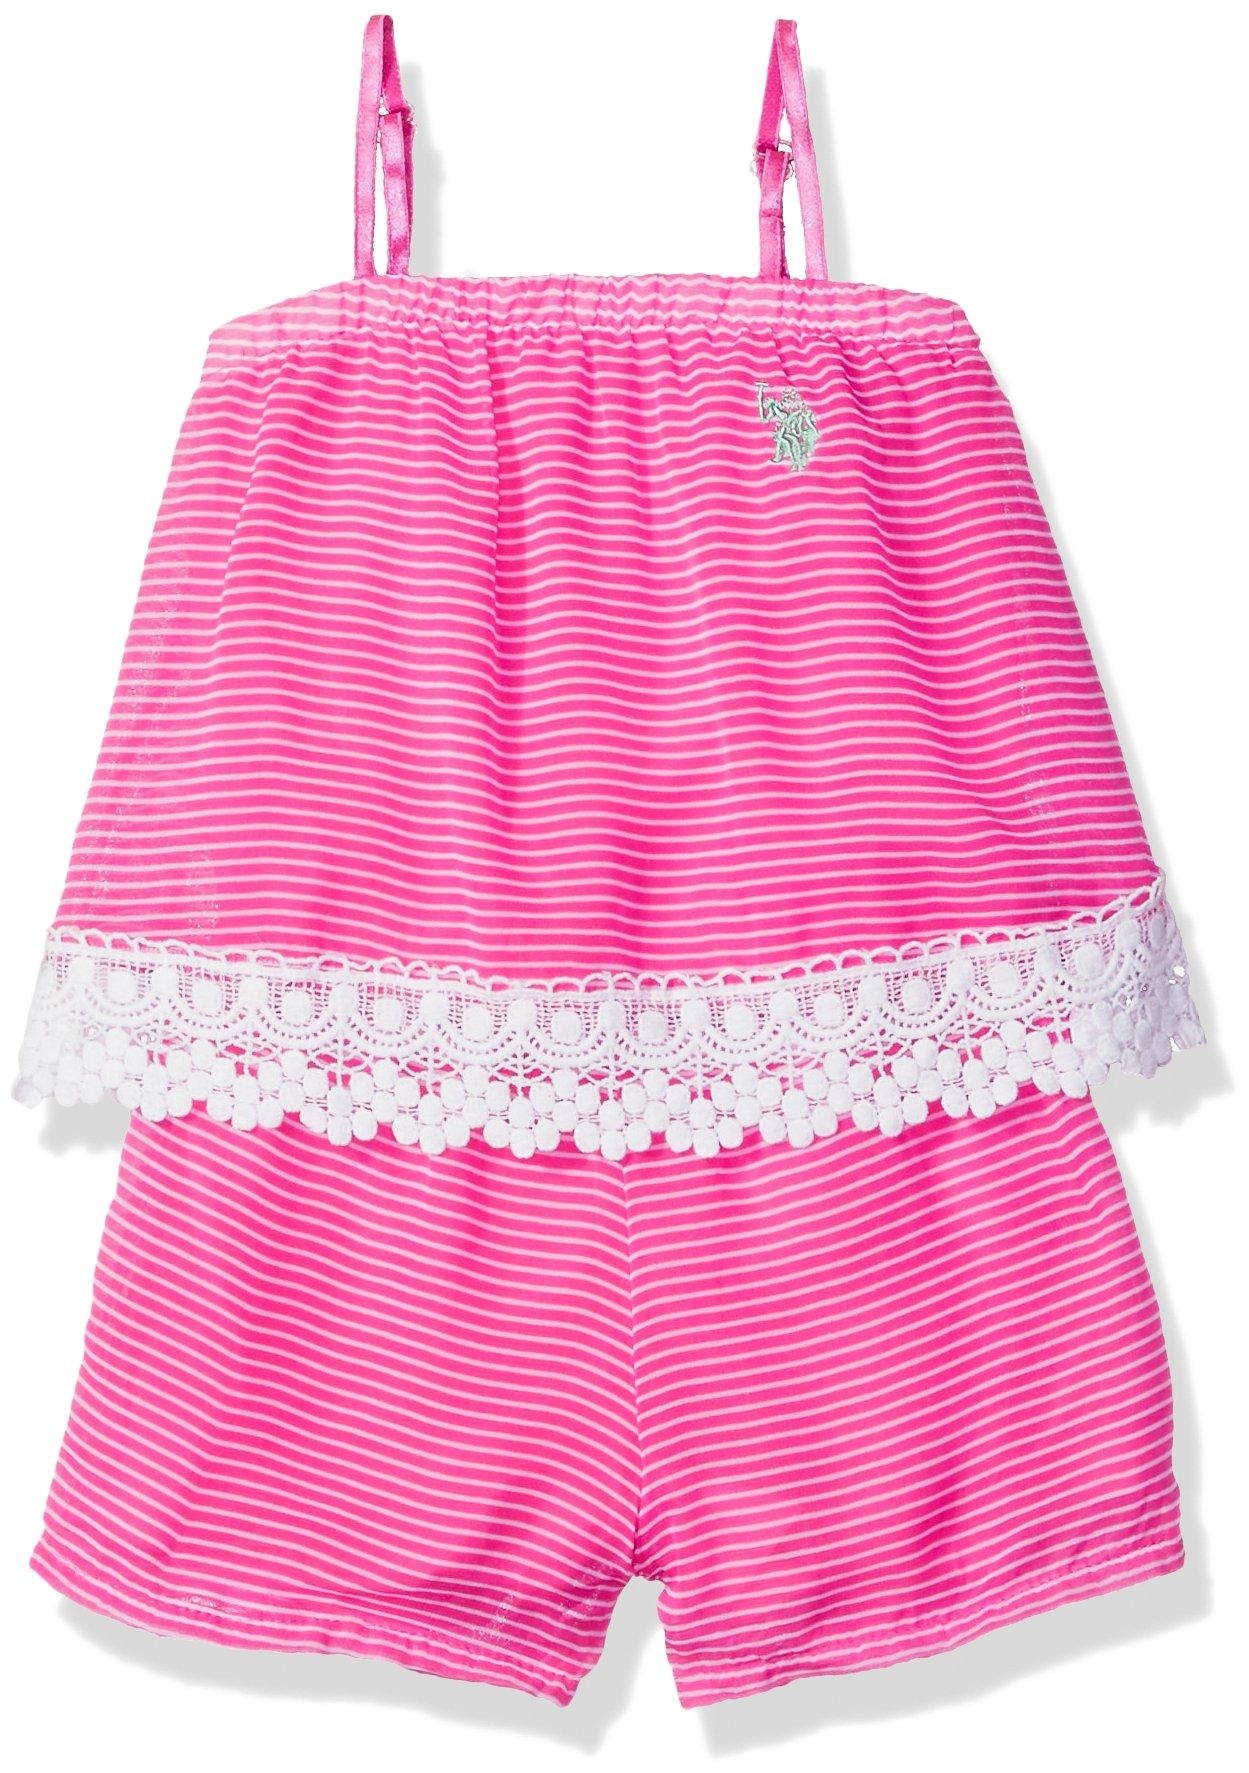 U.S. Polo Assn. Big Girls' Romper, Stripes Lace Romper Neon Hot Pink, 8